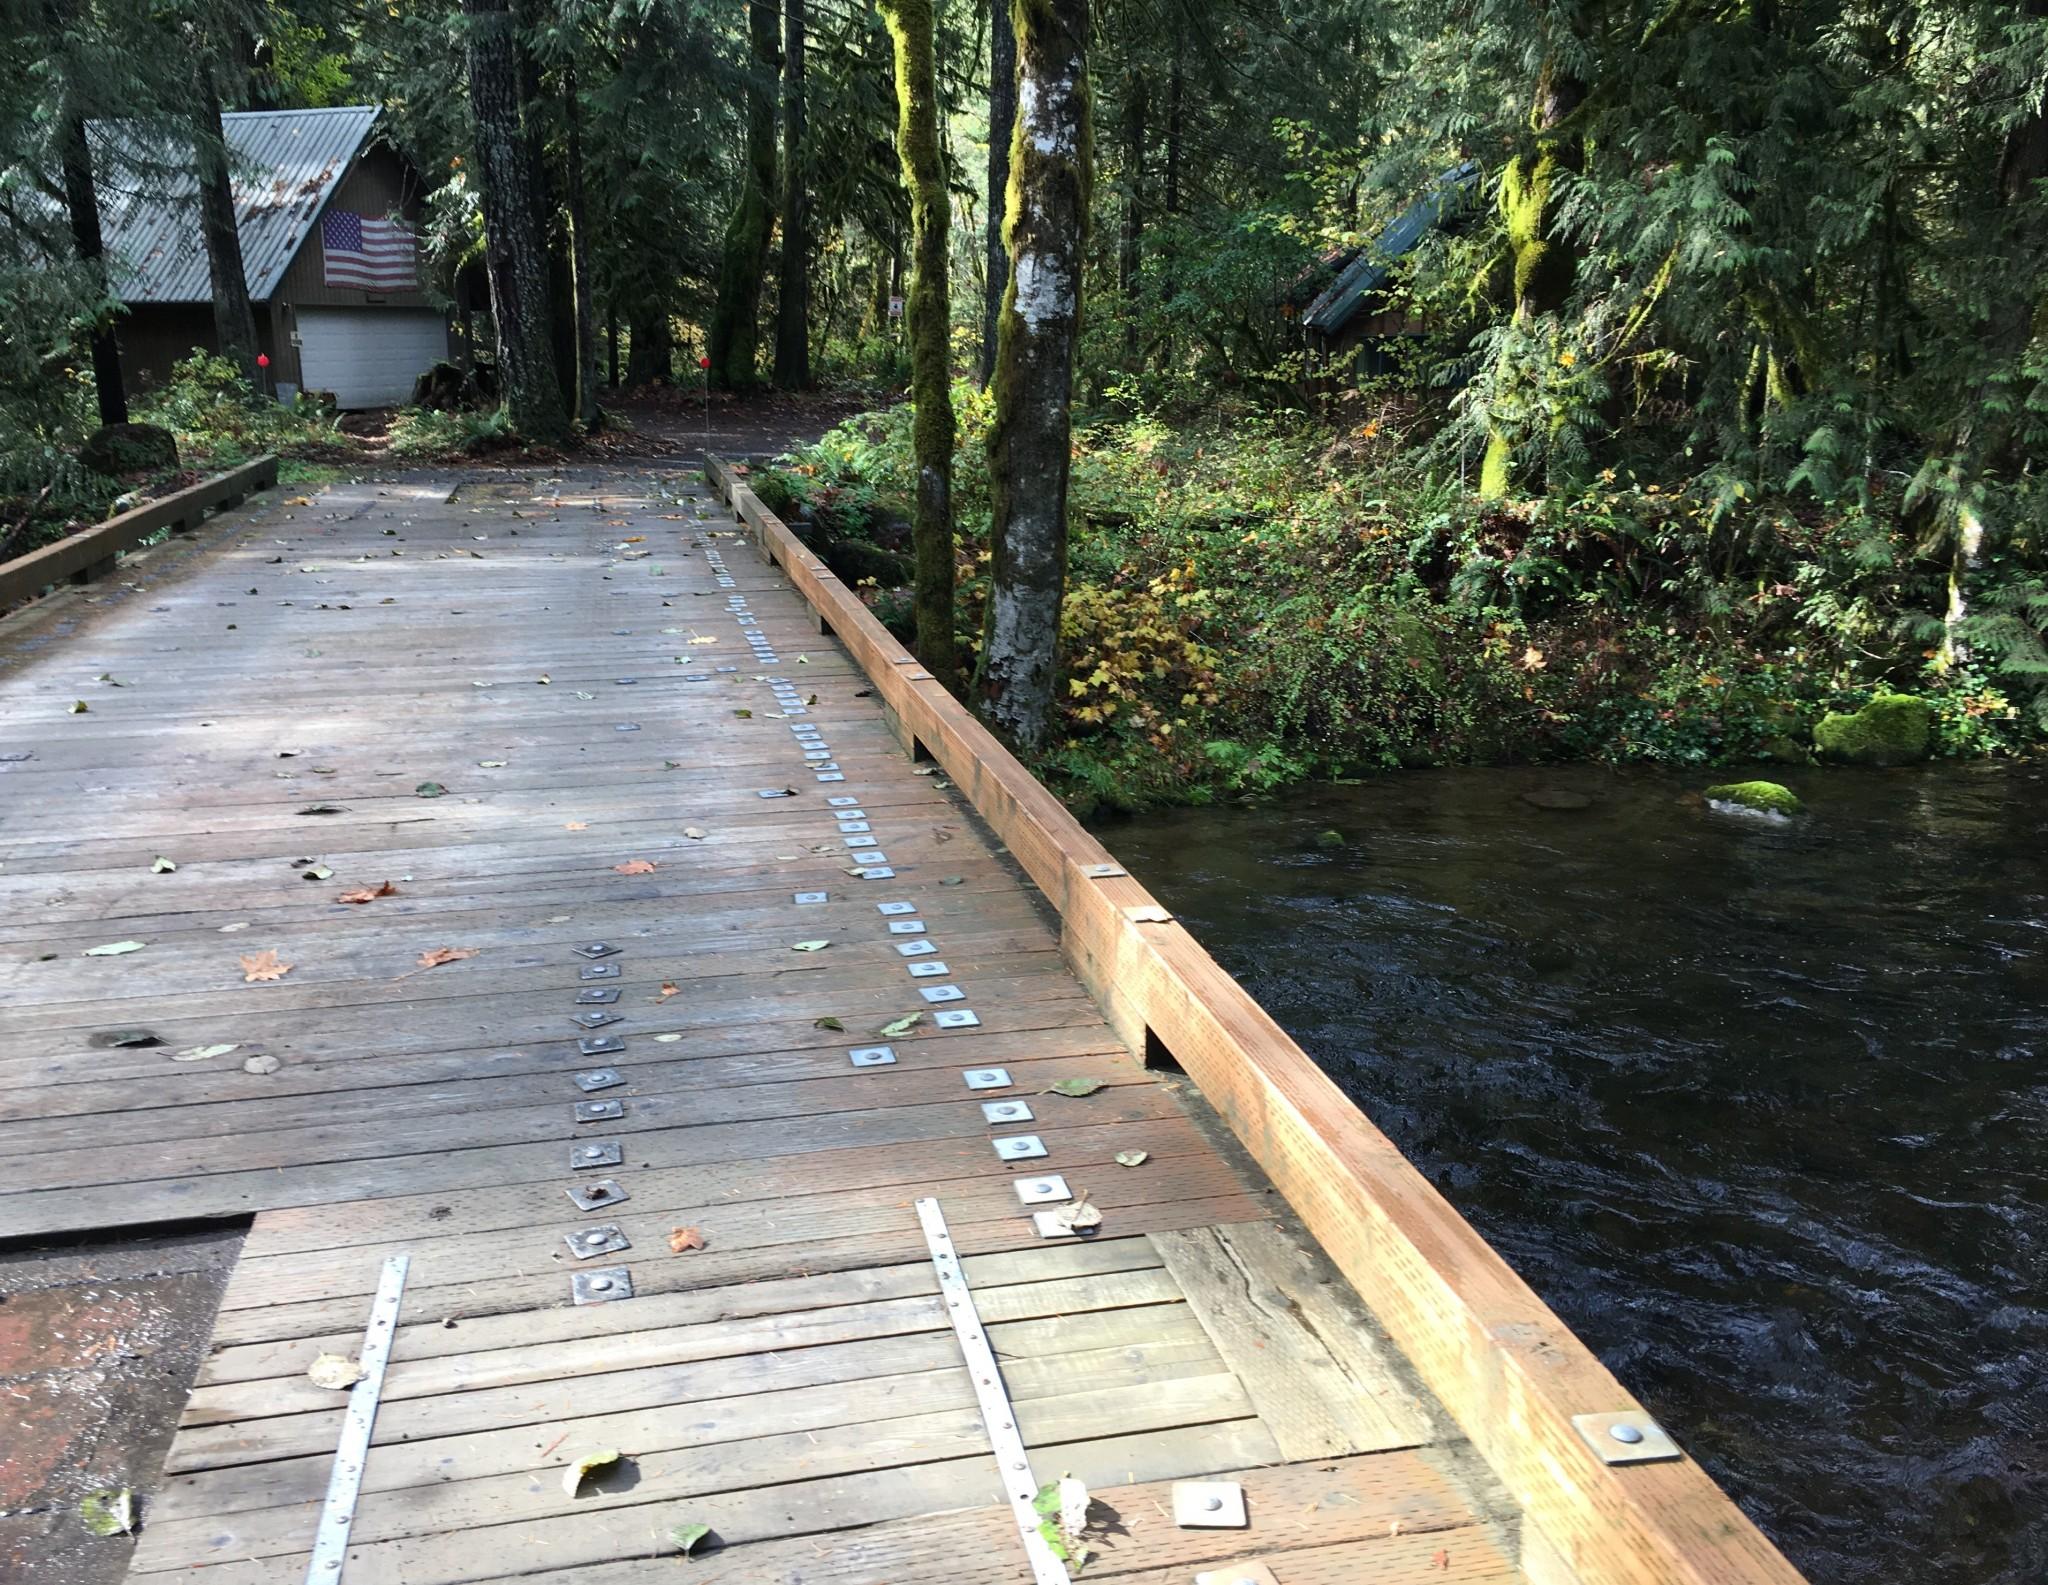 Wee bridge over the Salmon River.